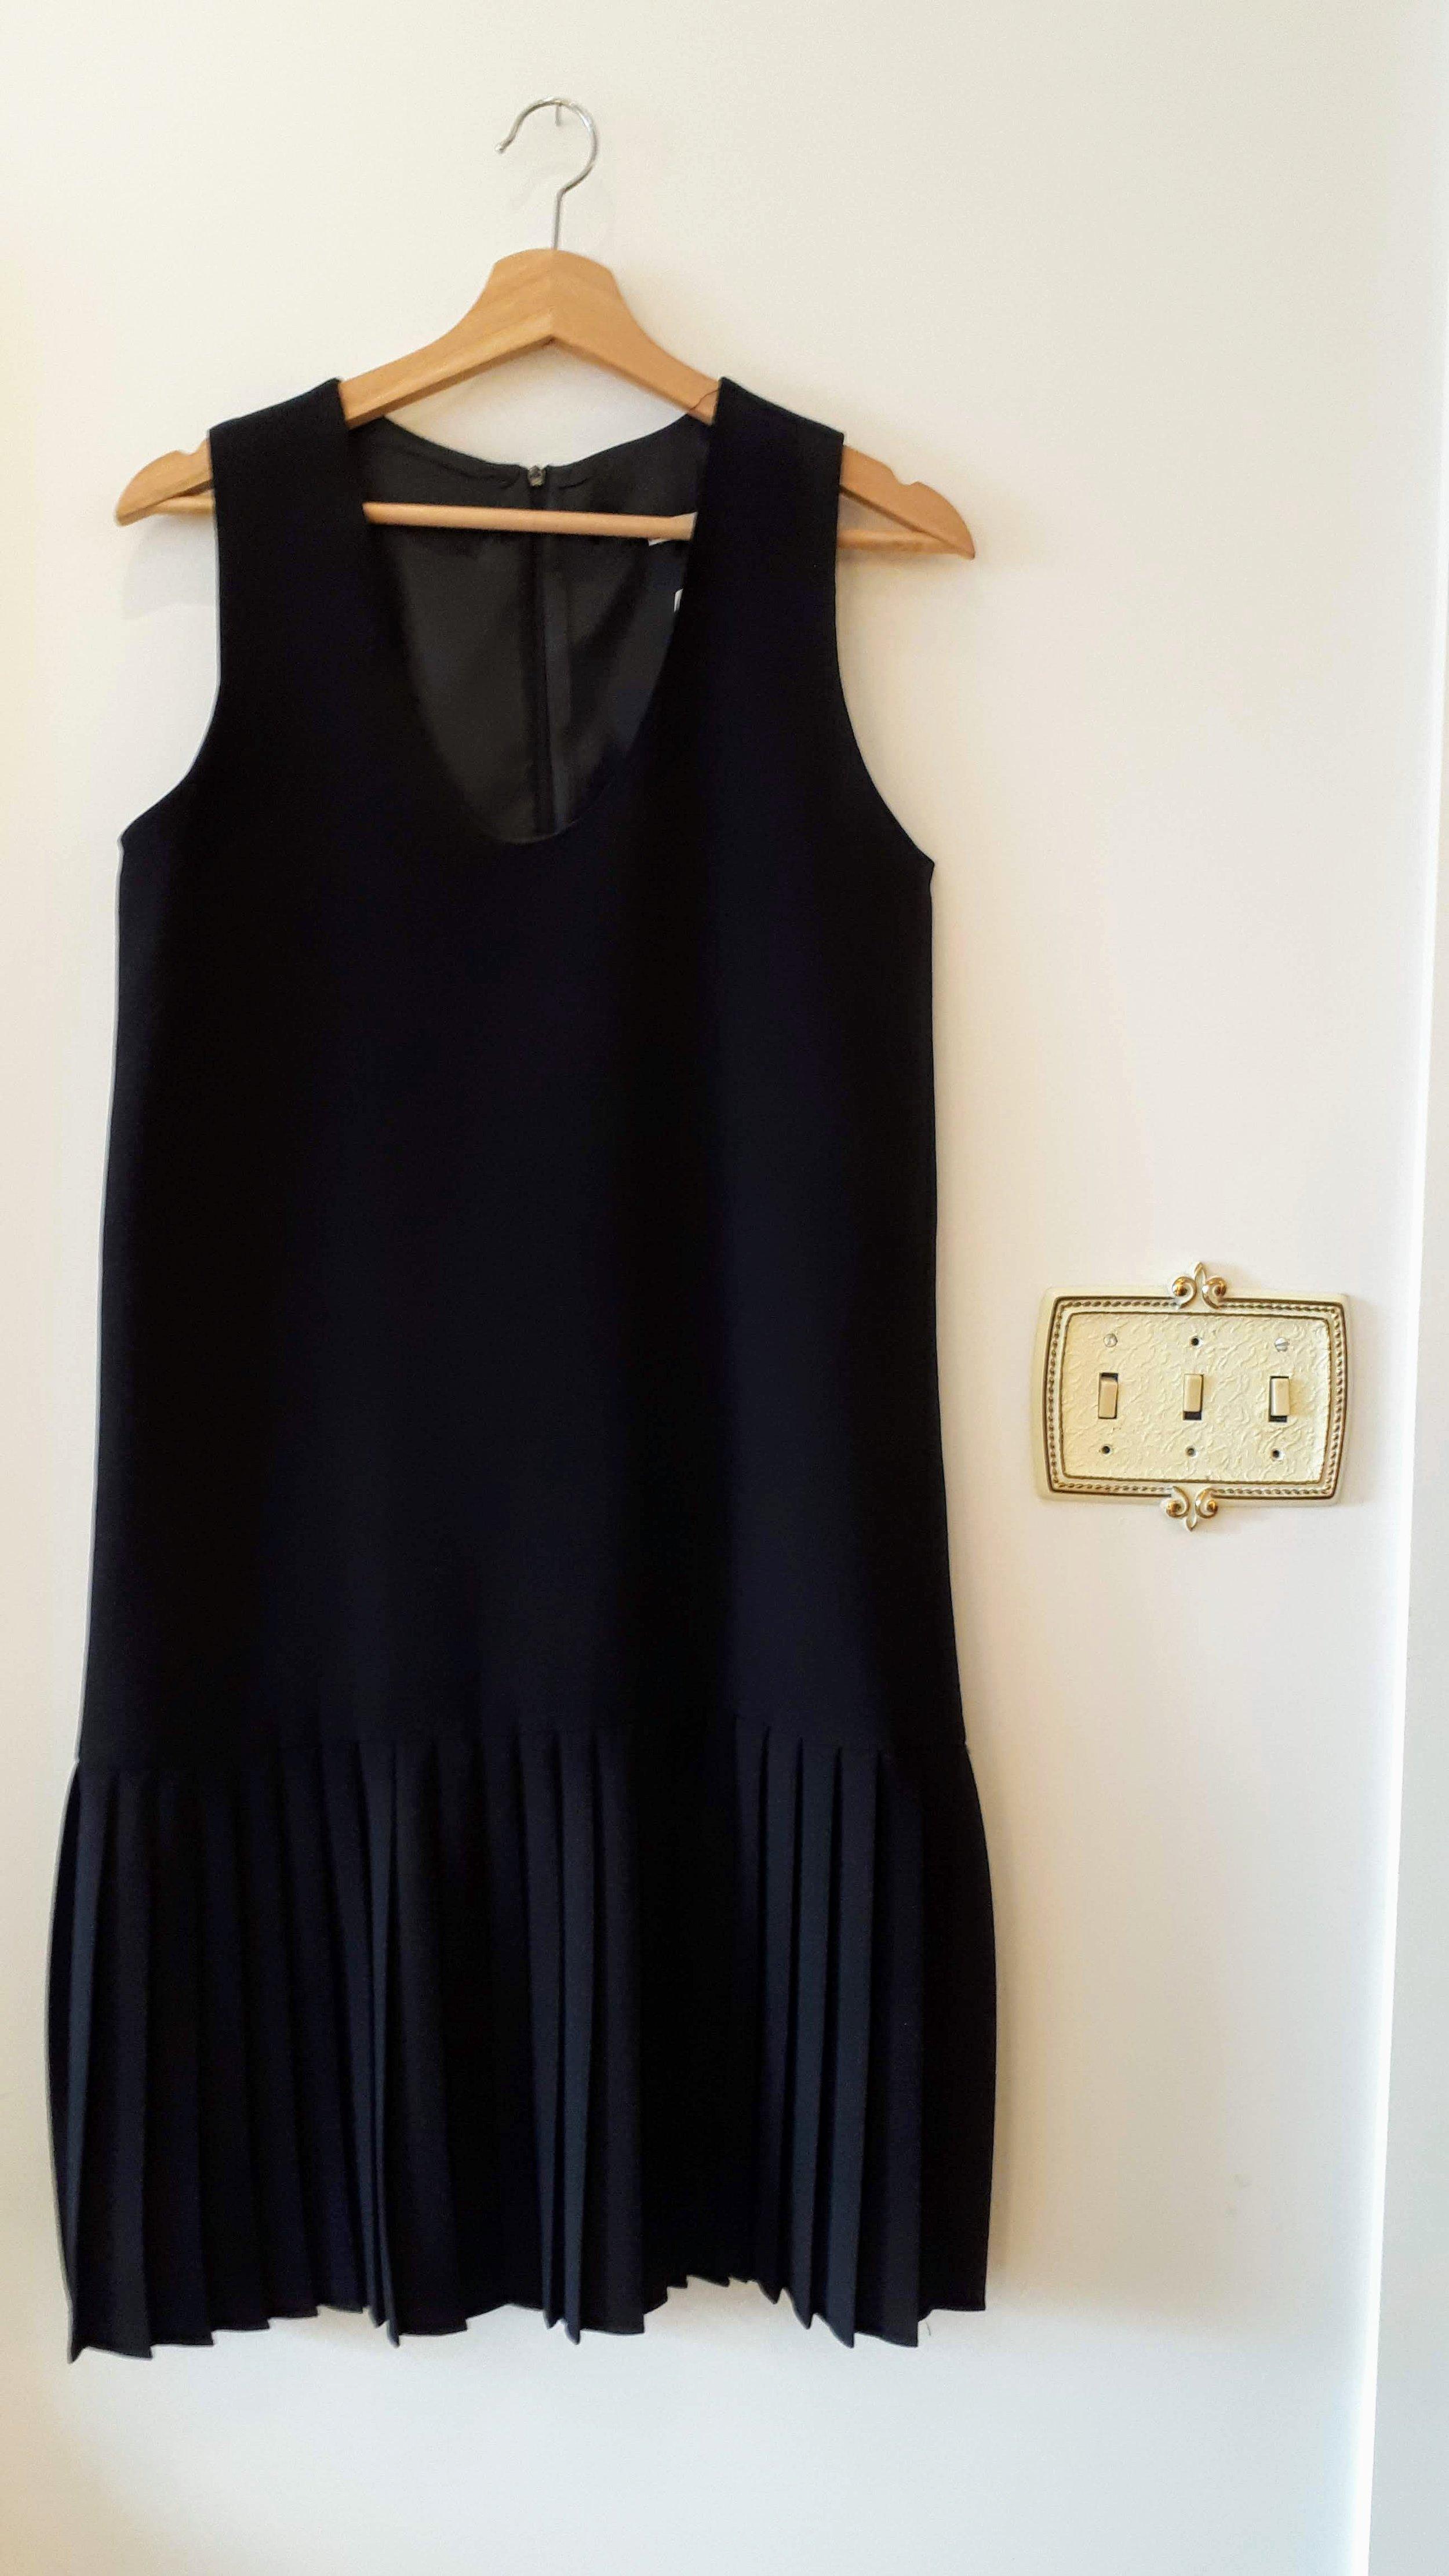 Oak+Fort dress; Size OS, $62